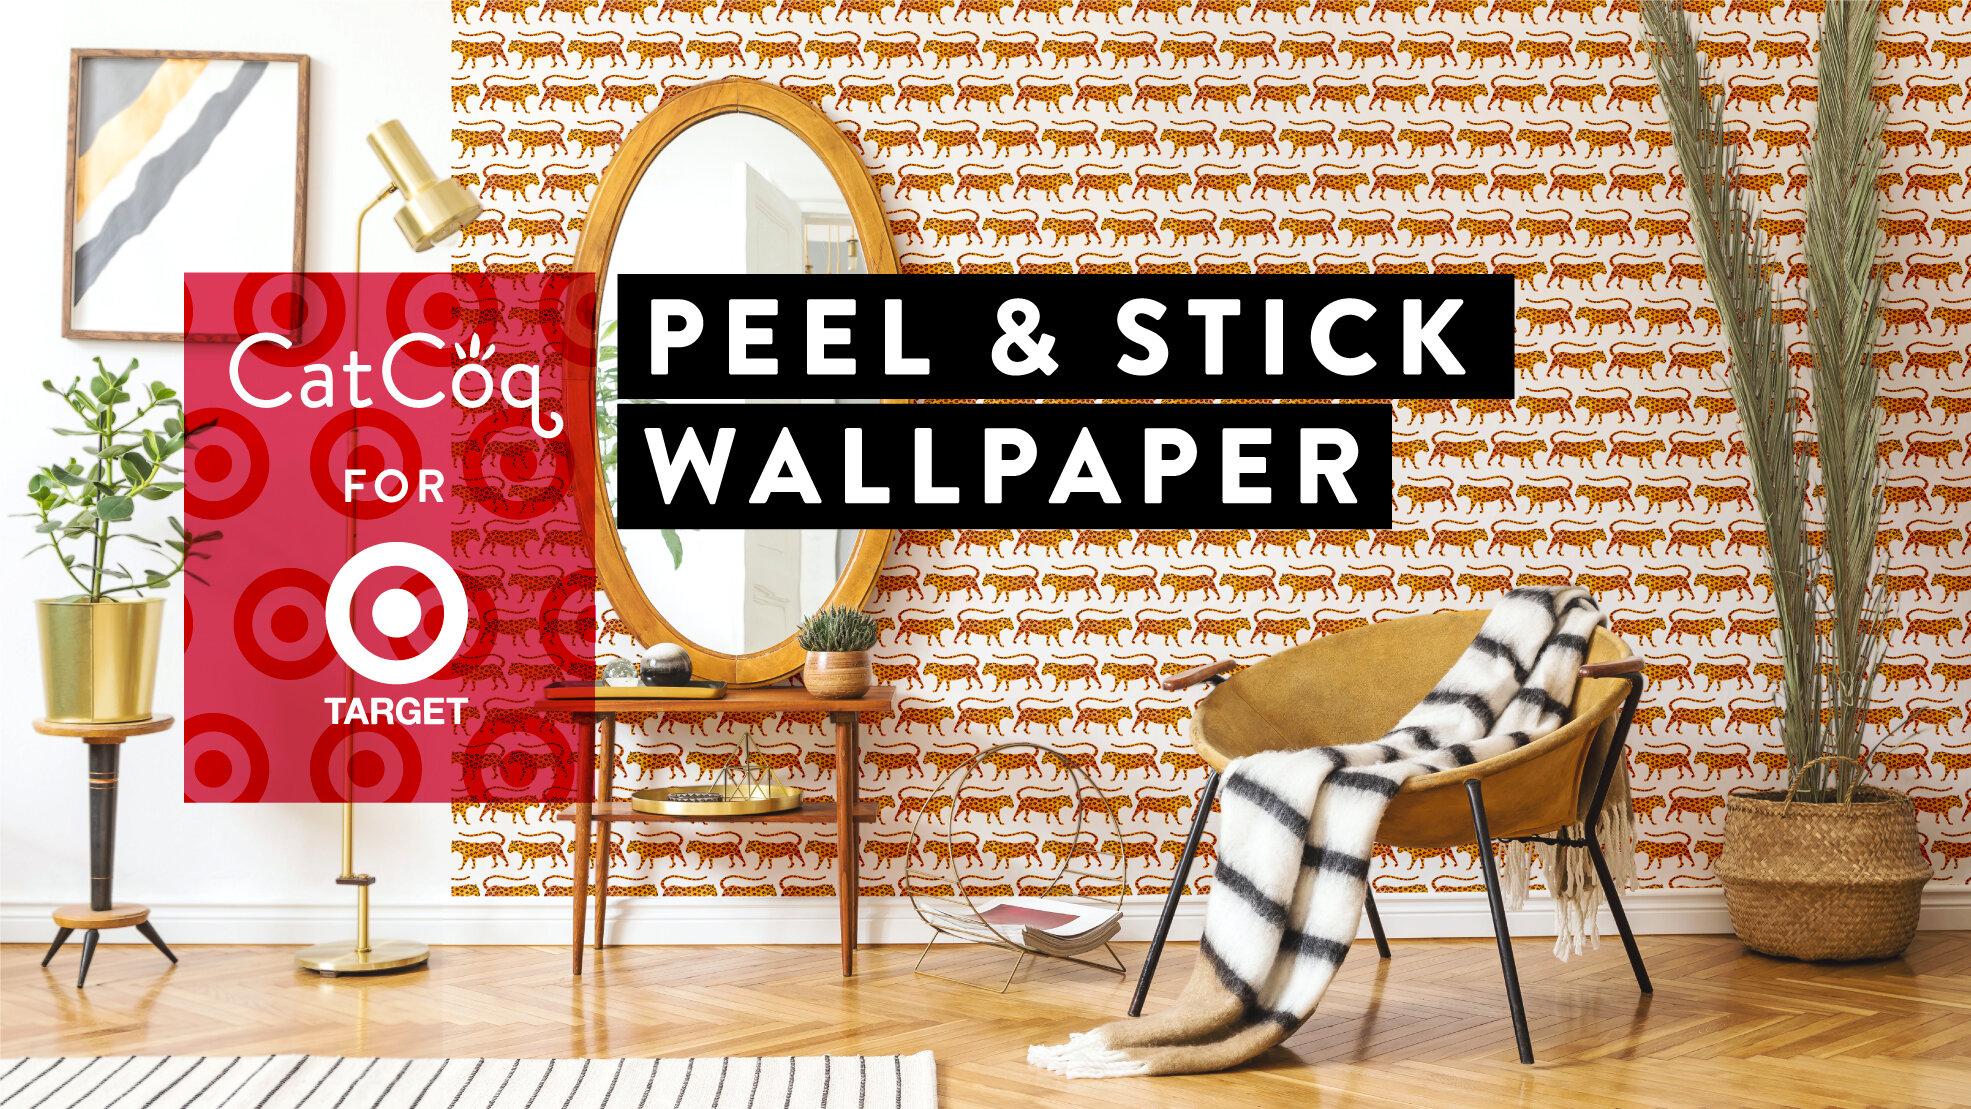 Catcoq Peel Stick Wallpaper Now Sold Through Target With Partner Roommates Decor Catcoq